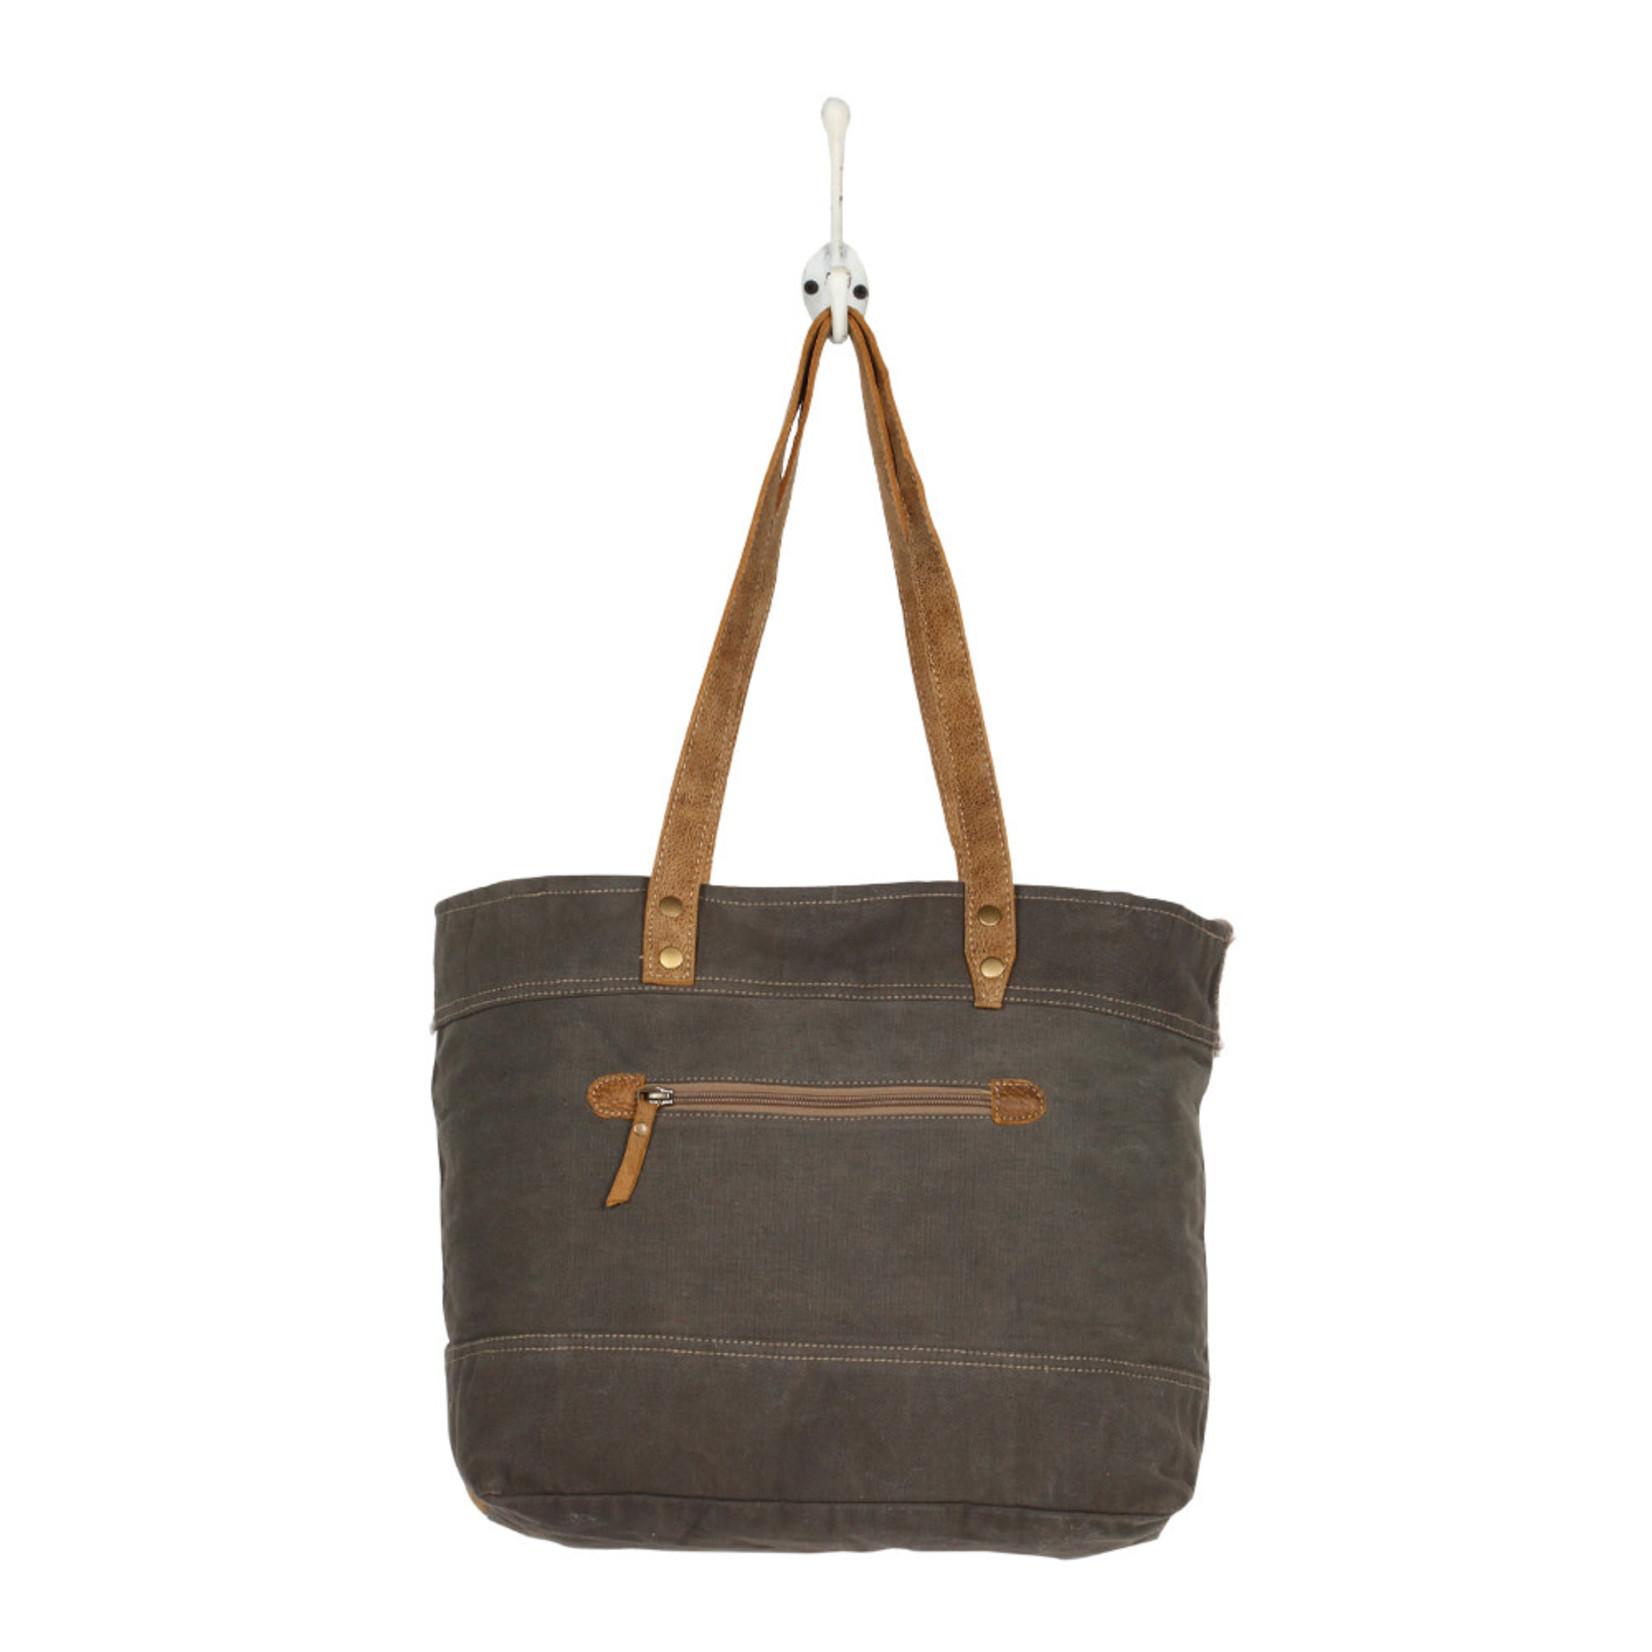 Myra Bags S-1268 Oromos Canvas Tote Bag